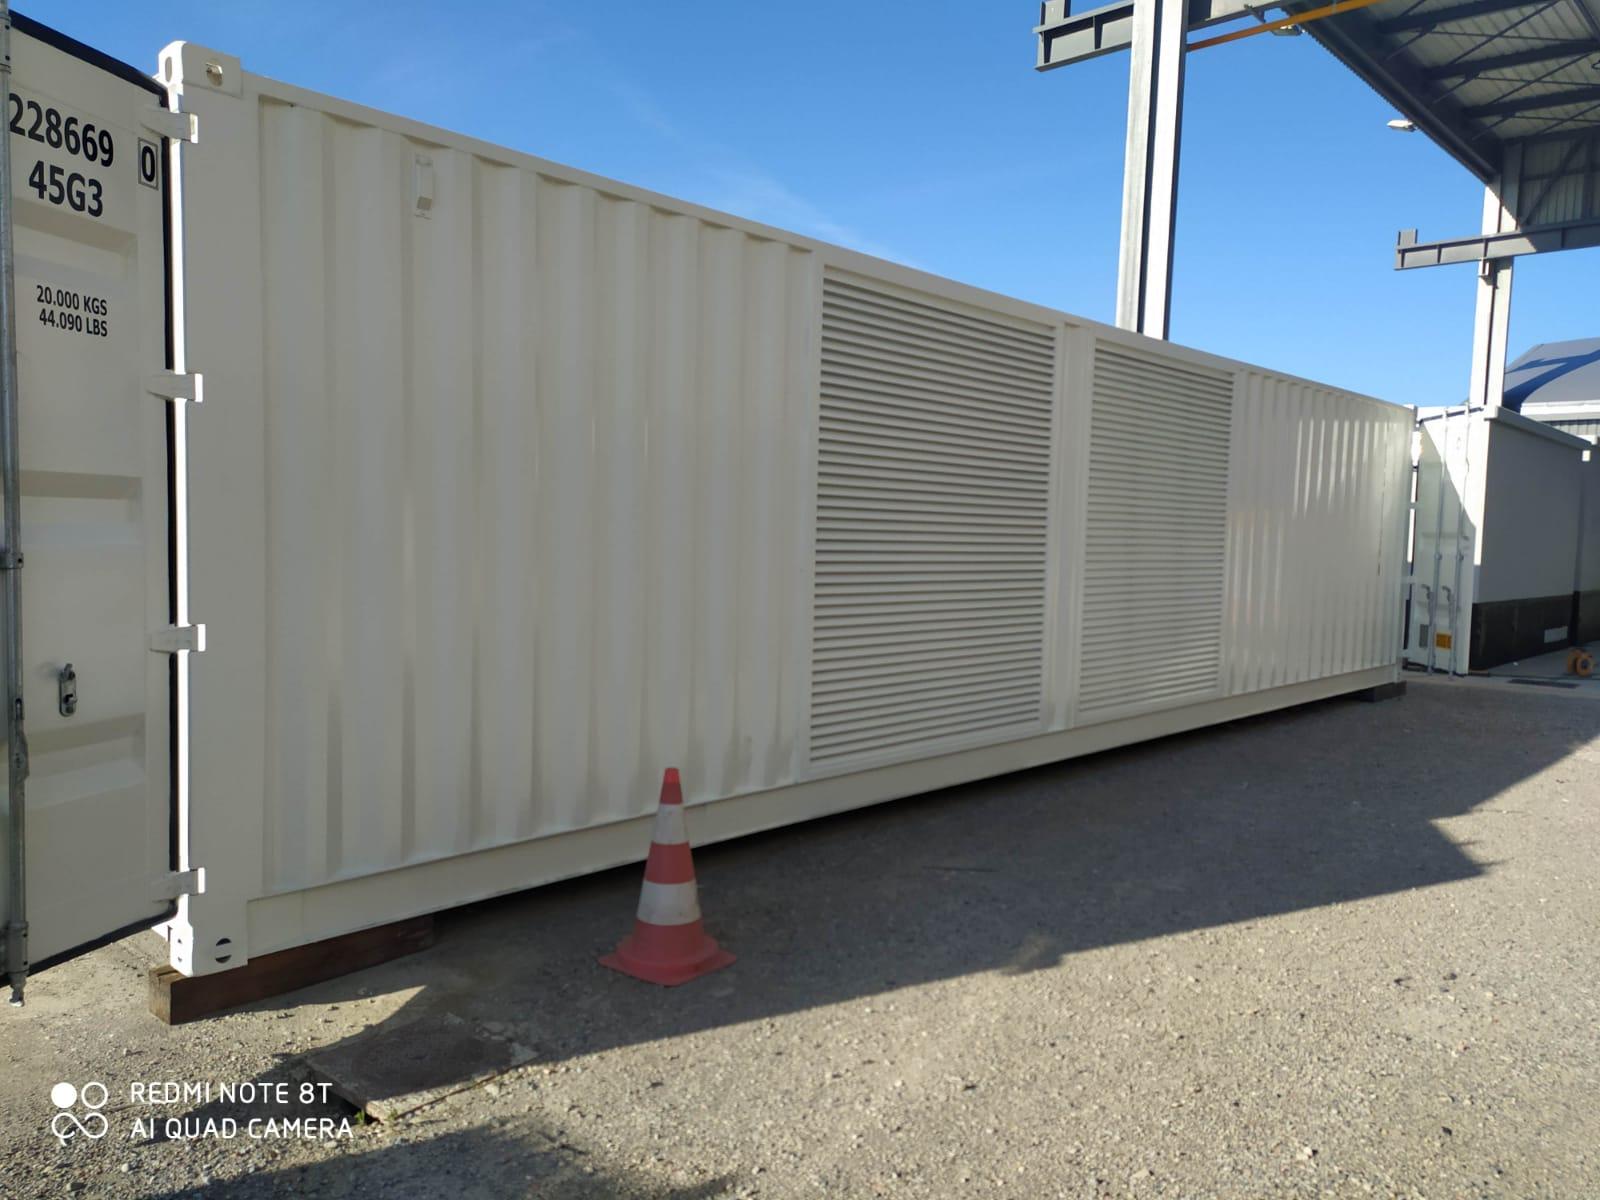 bullbox contenedores almacenamiento energia 04 - Containers for Energy Stockage